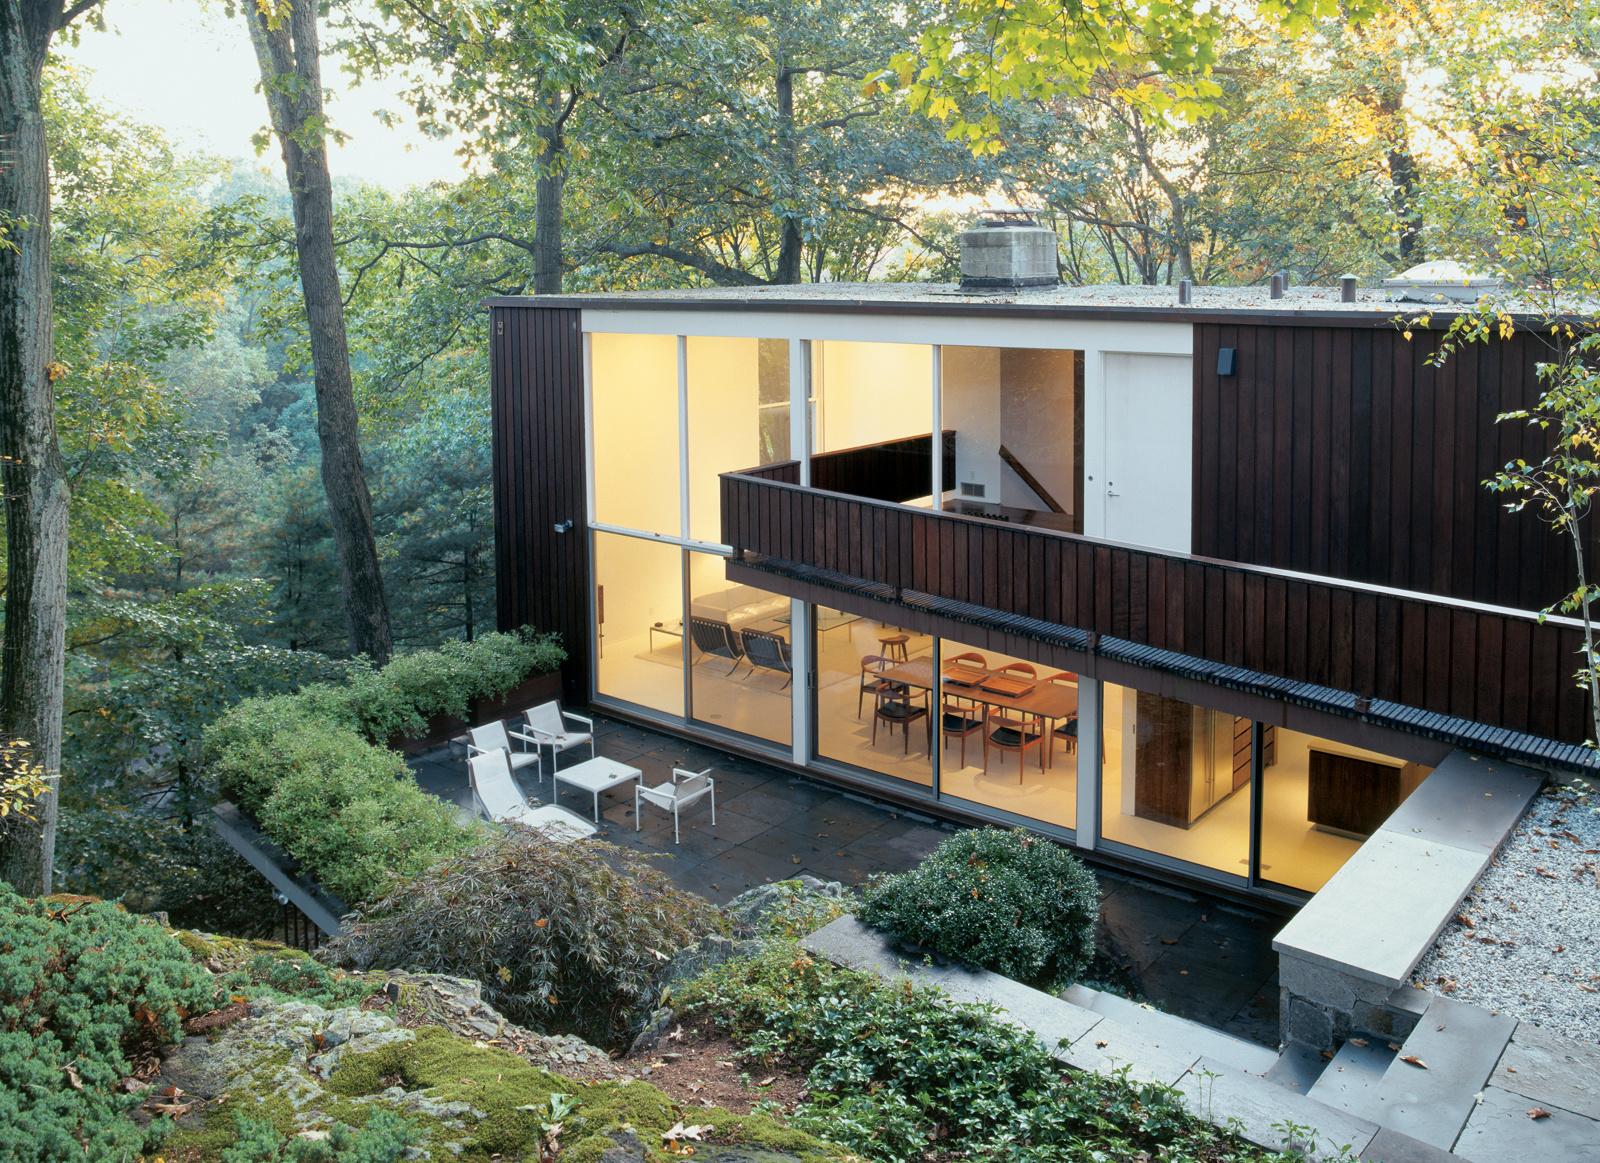 Bassam fellows house exterior patio